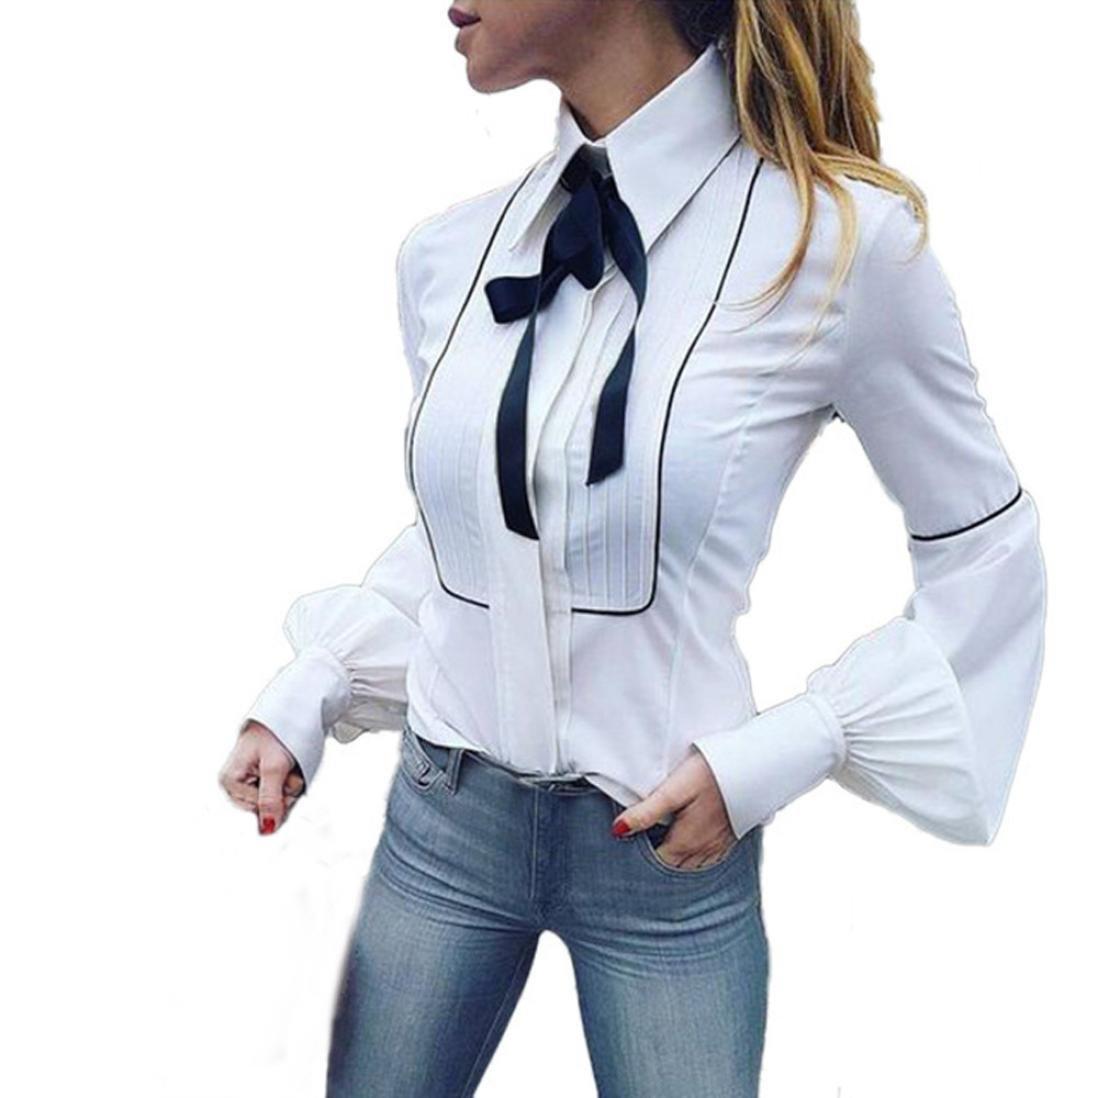 Clearance!Women Blouse Daoroka Sexy Office Work Wear Long Lantern Sleeve Bow Tie Shirt Elegant Casual Cute Tops (S, White)